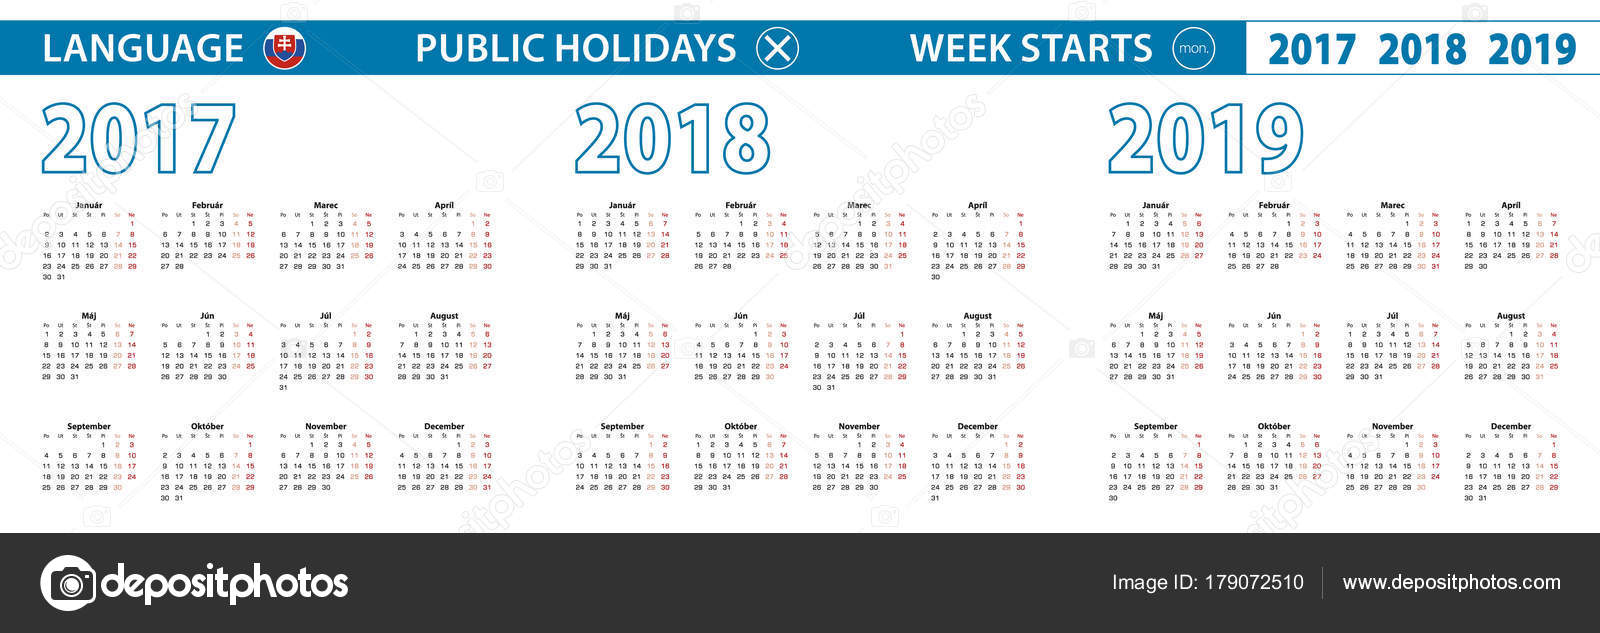 Simple calendar template in Slovak for 2017, 2018, 2019